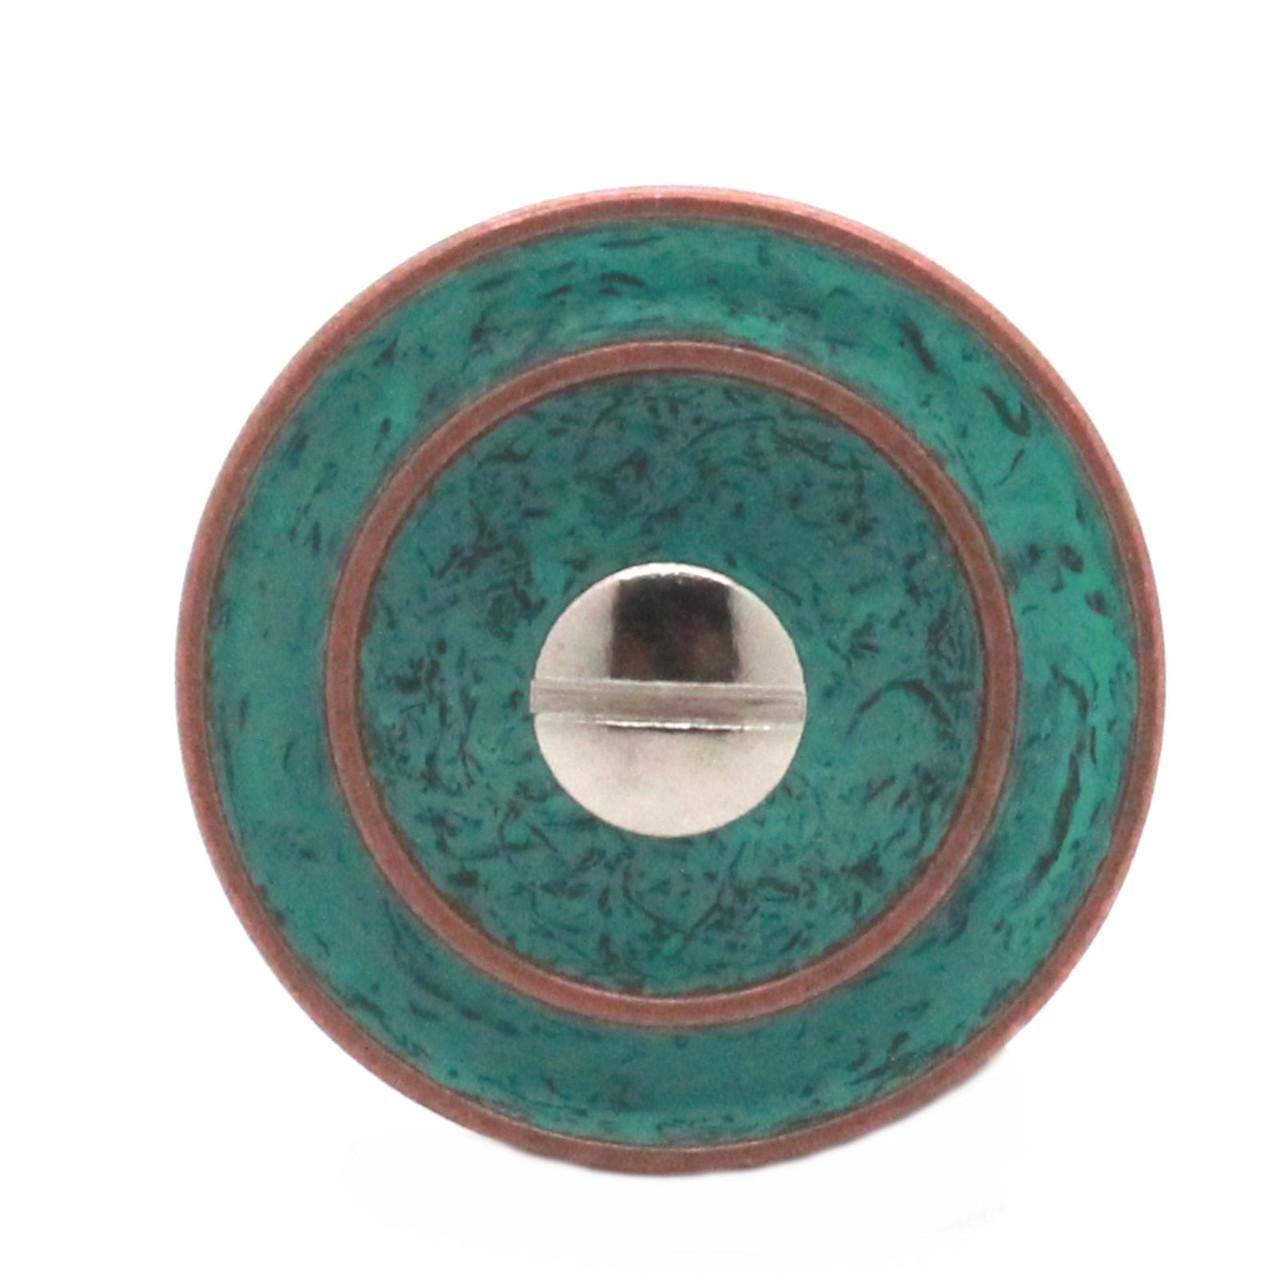 "Button Concho Rope Edge Copper Patina Screw Back 1-1/4"" Back"